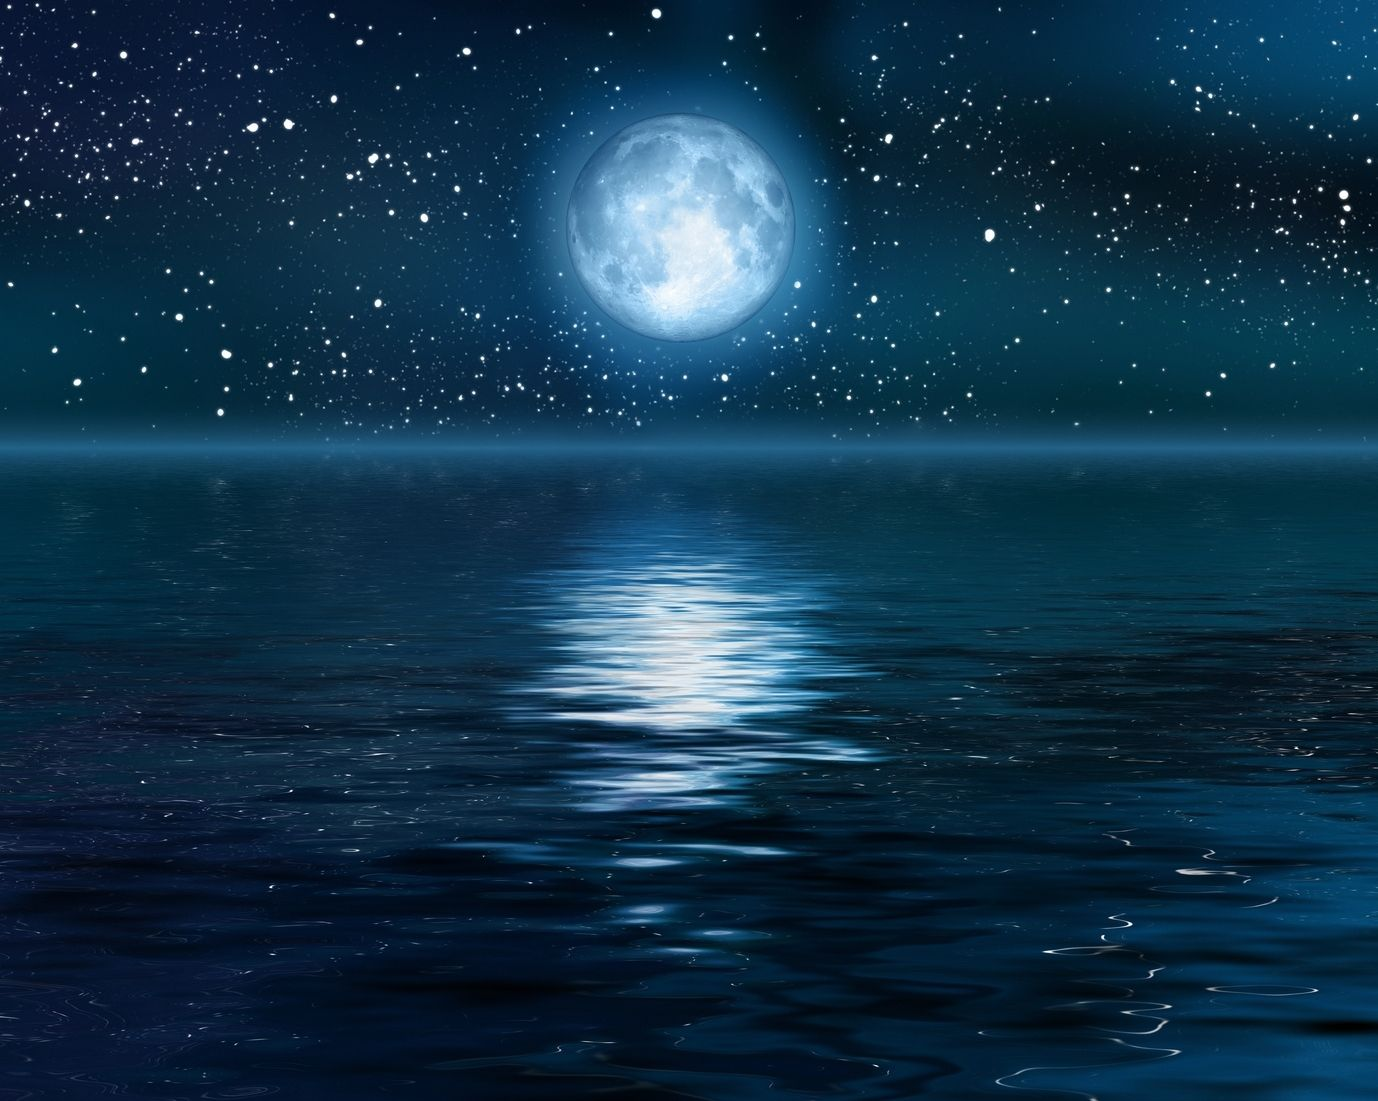 Pin De Summer Moon Em Reflections Lua Azul Pintura De Lua Bela Lua Hd wallpaper sea moon water reflection